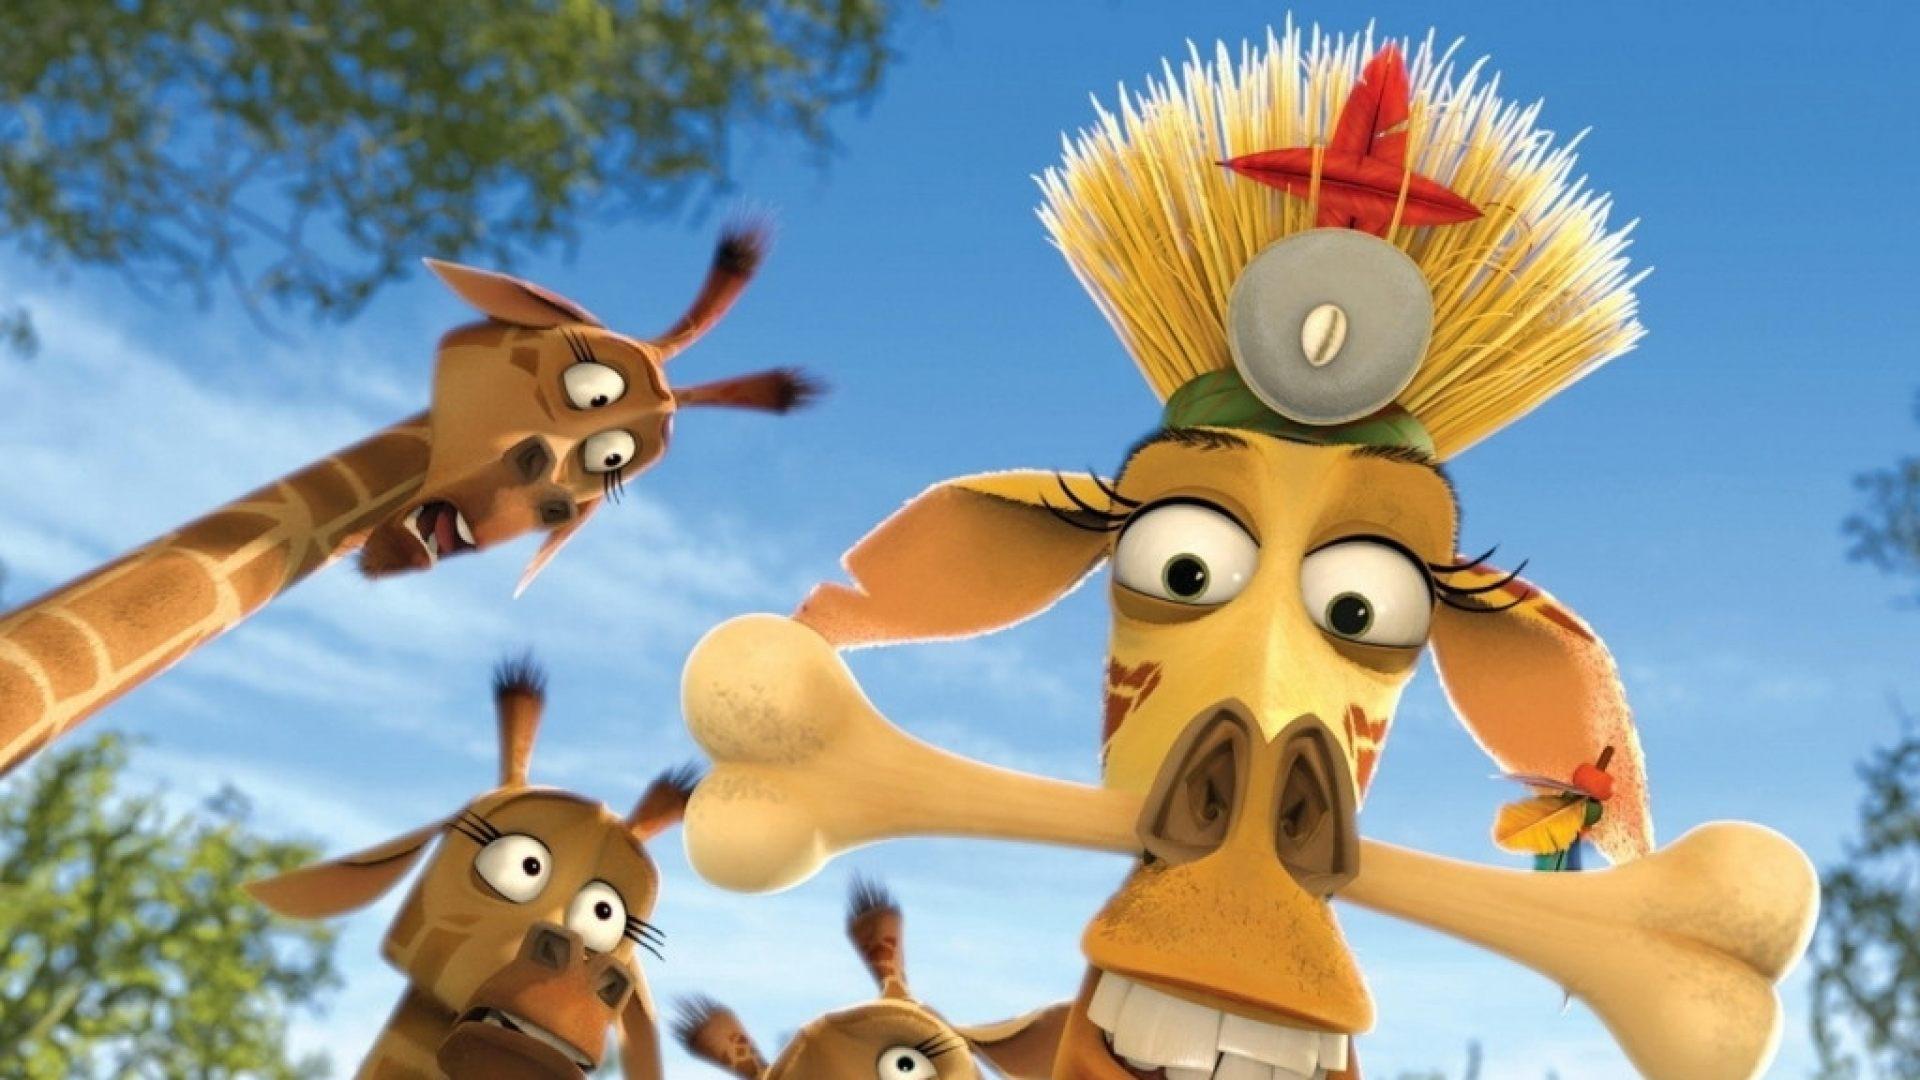 Jirafa de Madagascar Melman - 1920x1080 :: Fondos de pantalla y ...